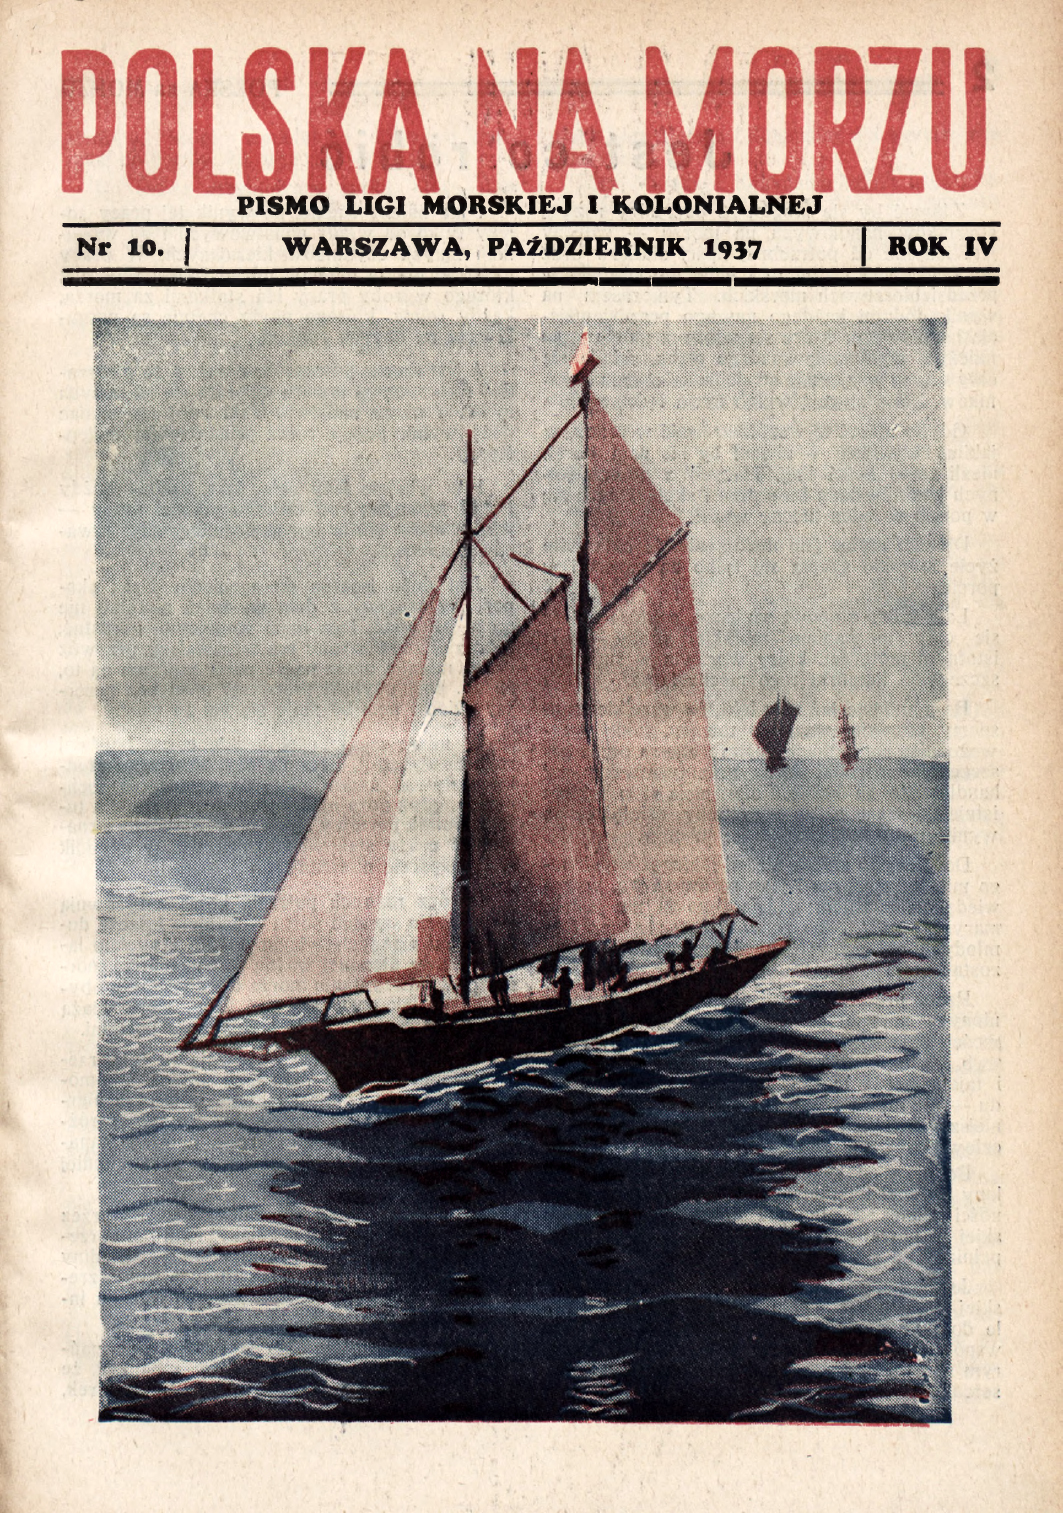 Polska na Morzu : pismo Ligi Morskiej i Kolonjalnej. - Liga Morska i Kolonjalna, 1937, nr 10